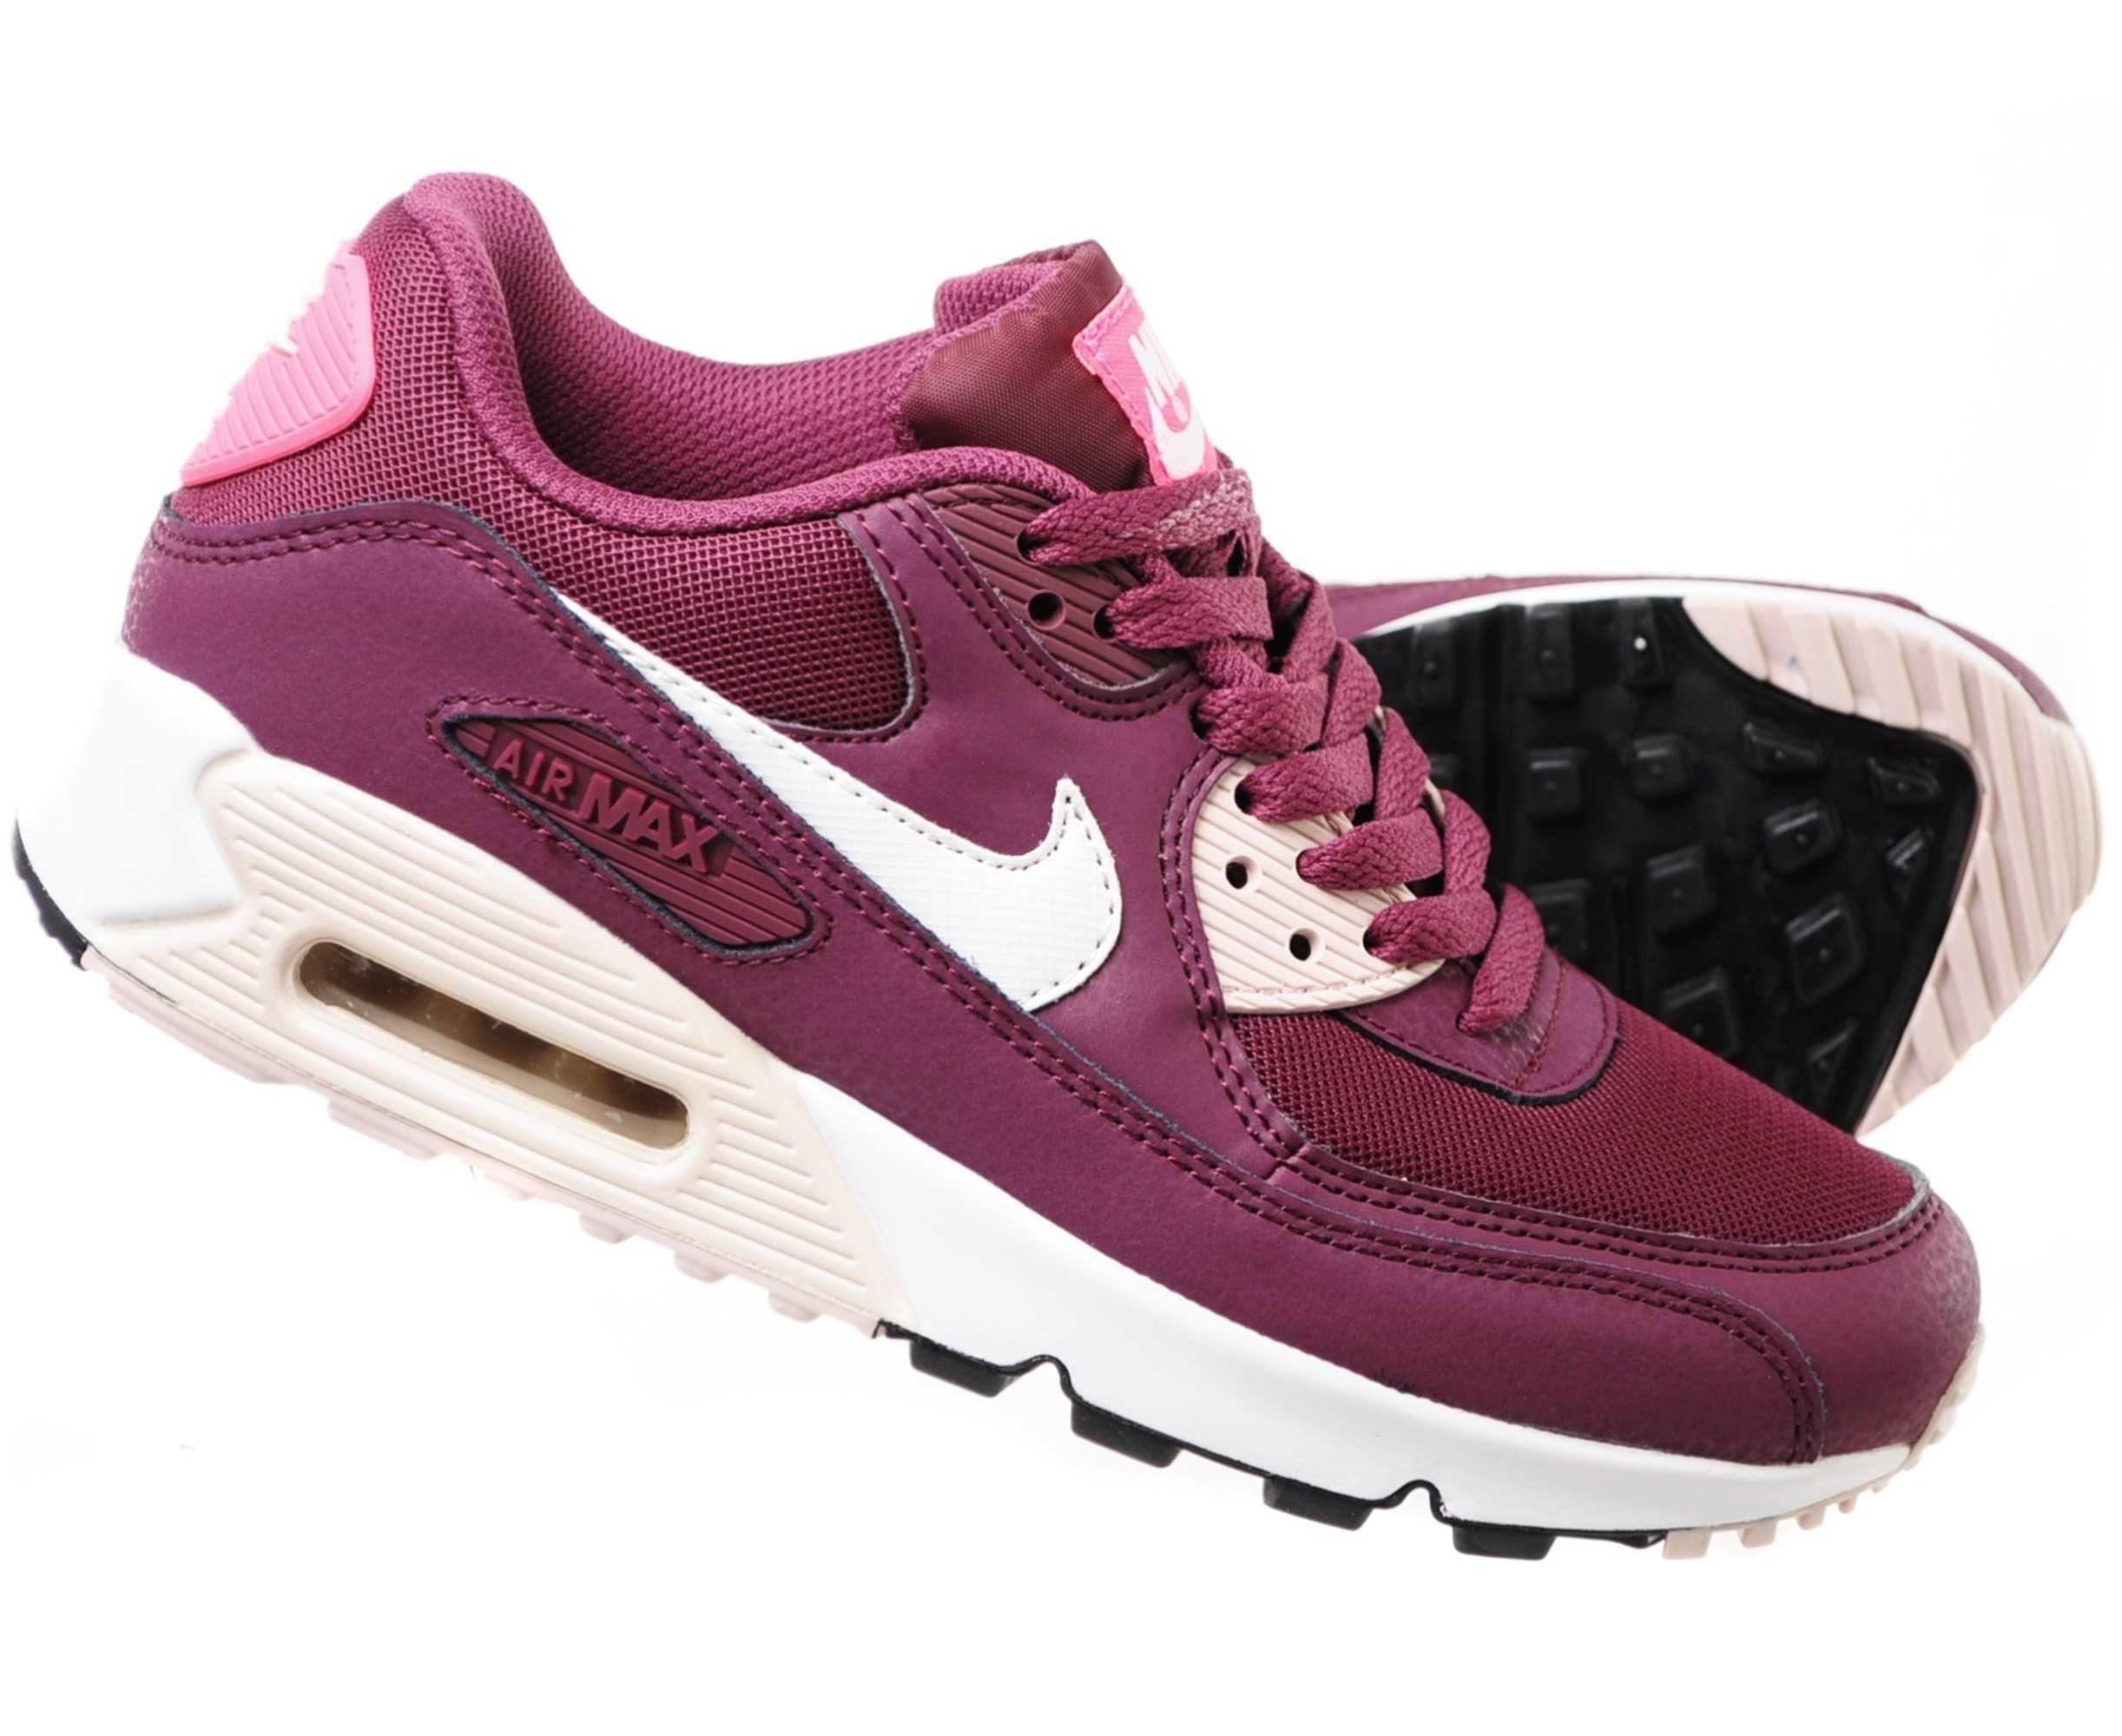 Nike Air Max 90 Essential Buty Damskie 38 6899367272